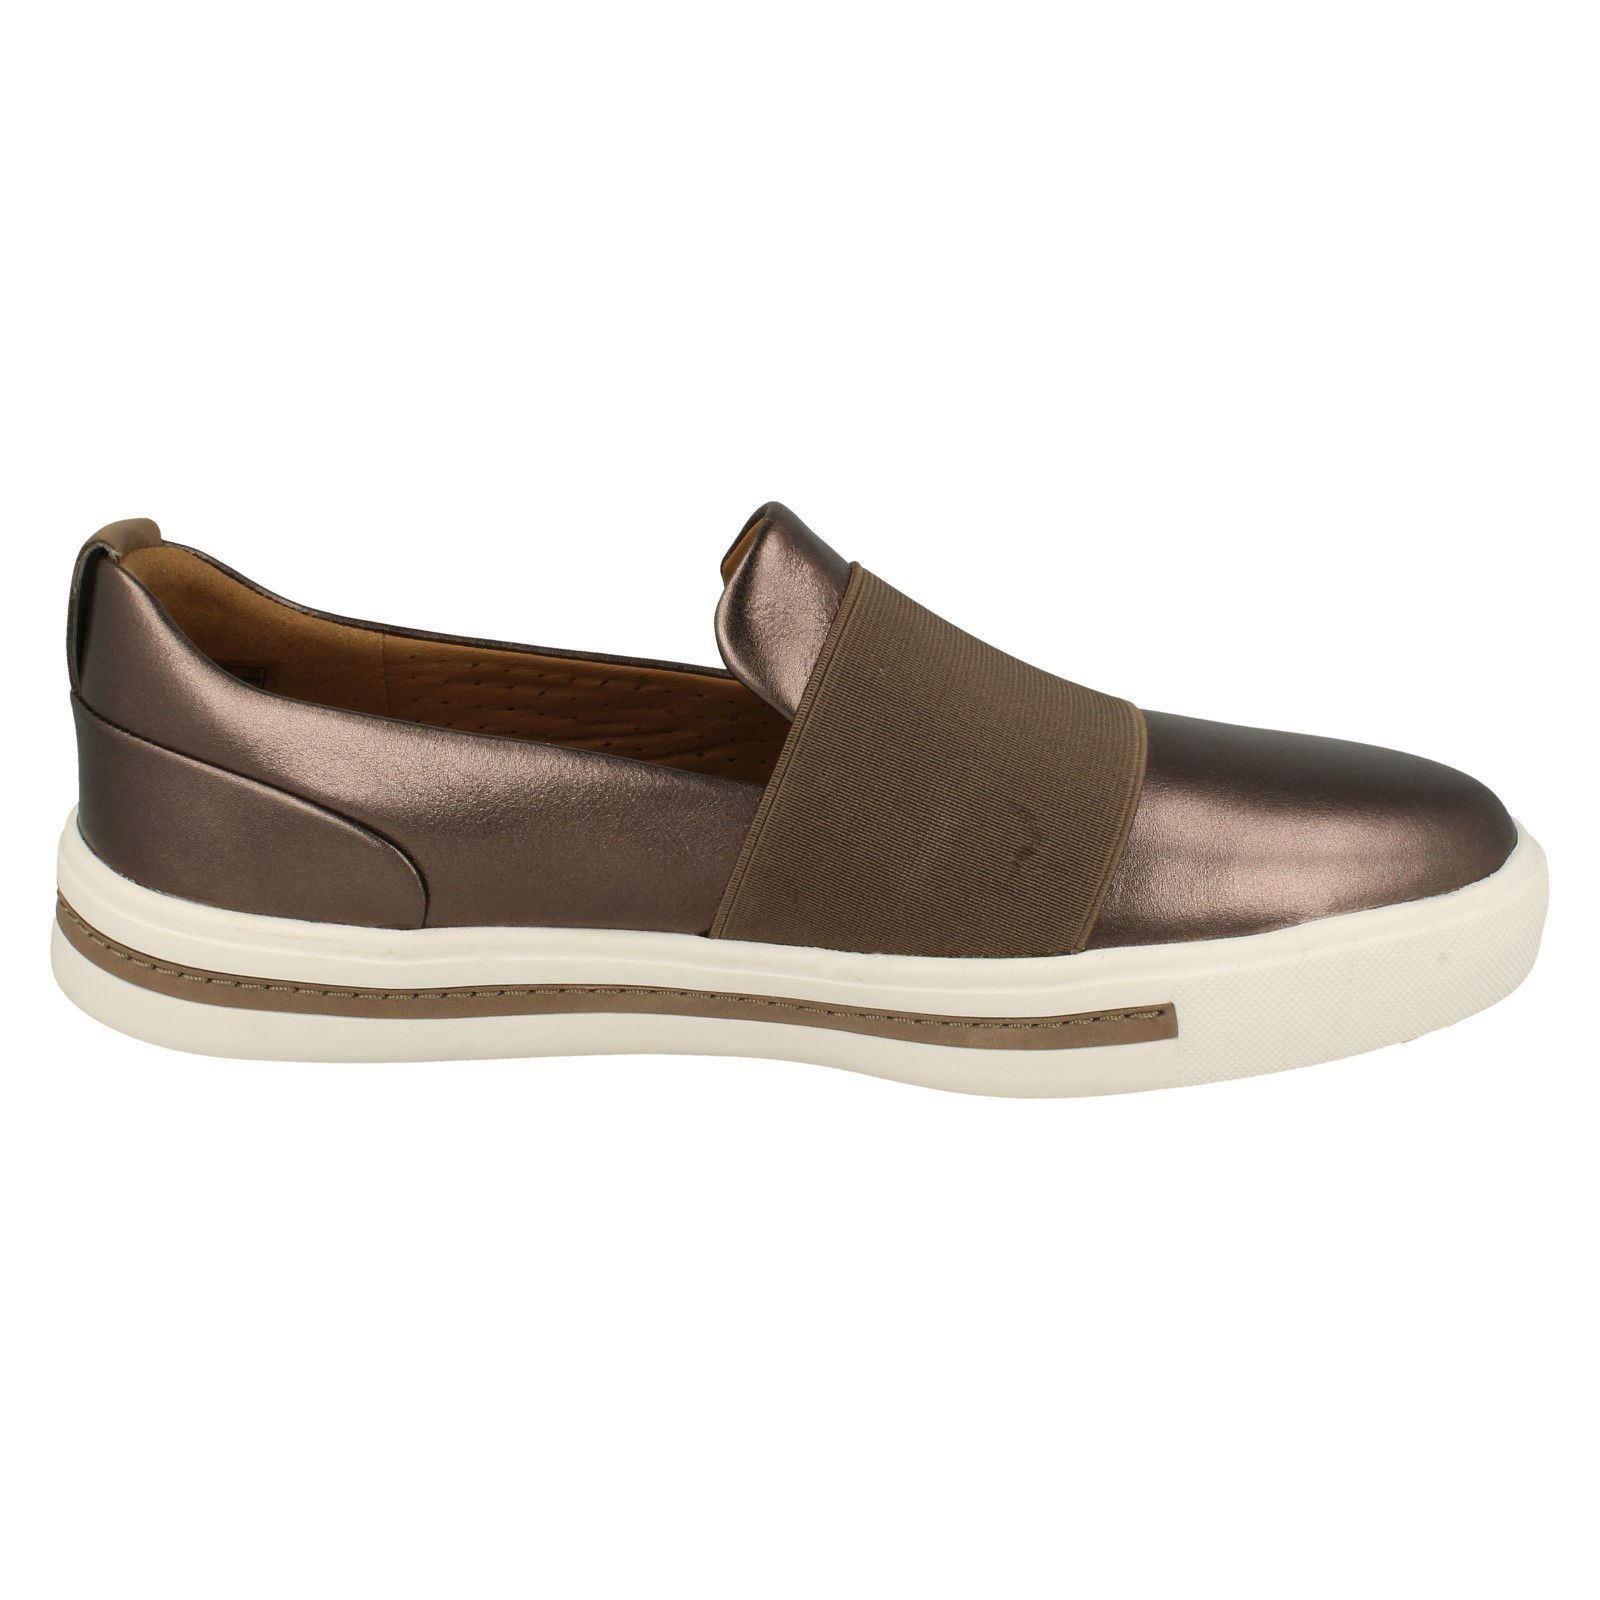 Metallic oro Unstructured Clarks Shoes Slip Maui Un Pebble Step Ladies On Uzw65qxvv